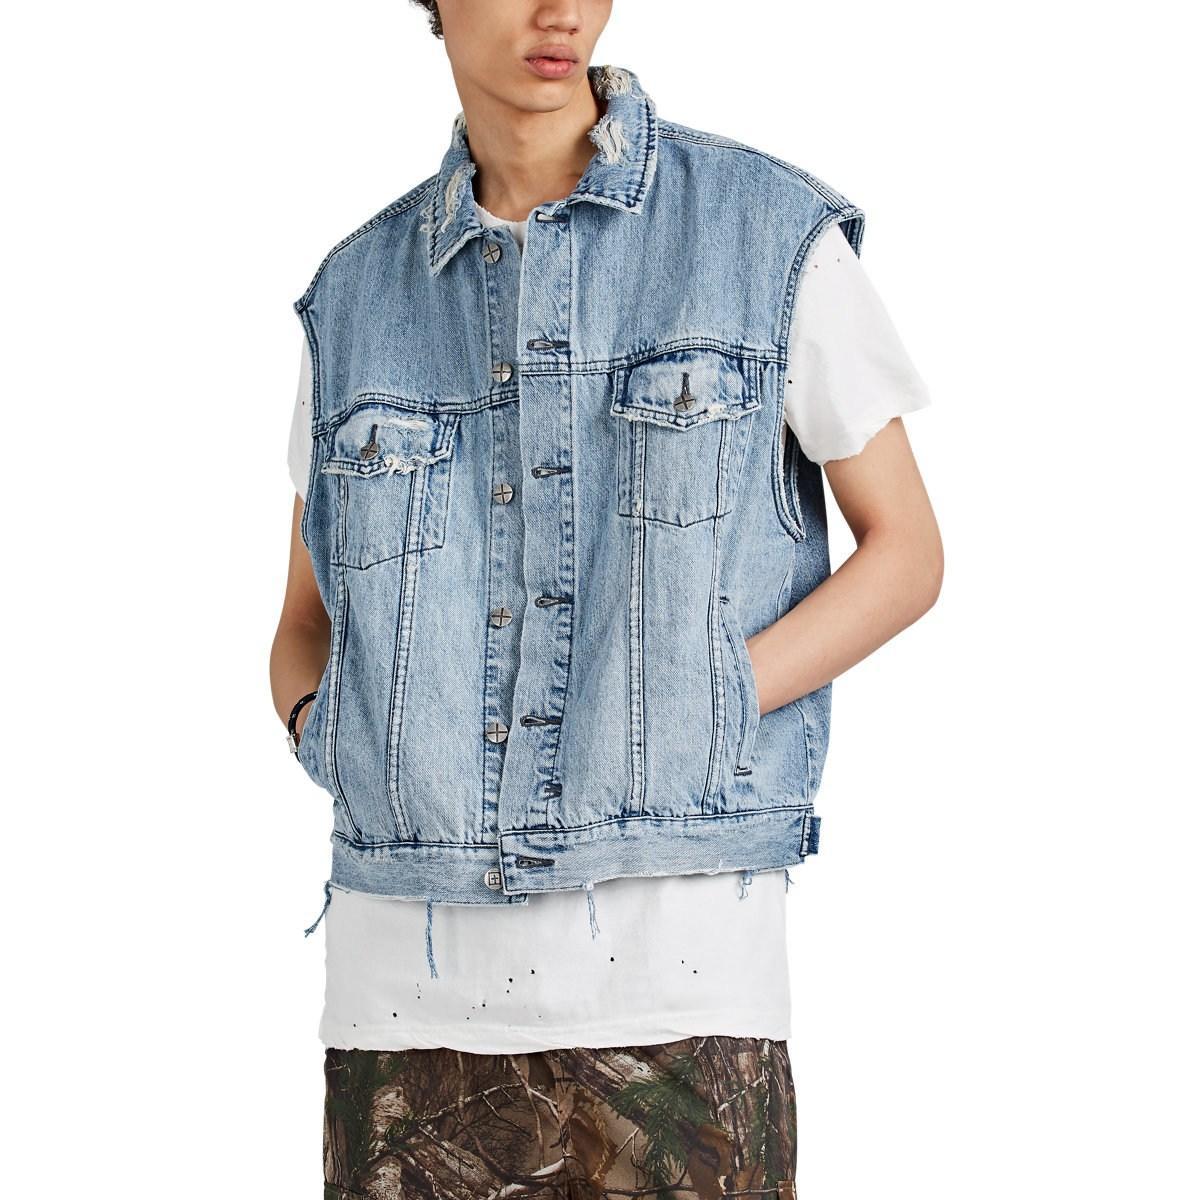 15ed268e48ab Lyst - Ksubi Vice Acid-washed Distressed Cotton Denim Vest in Blue ...